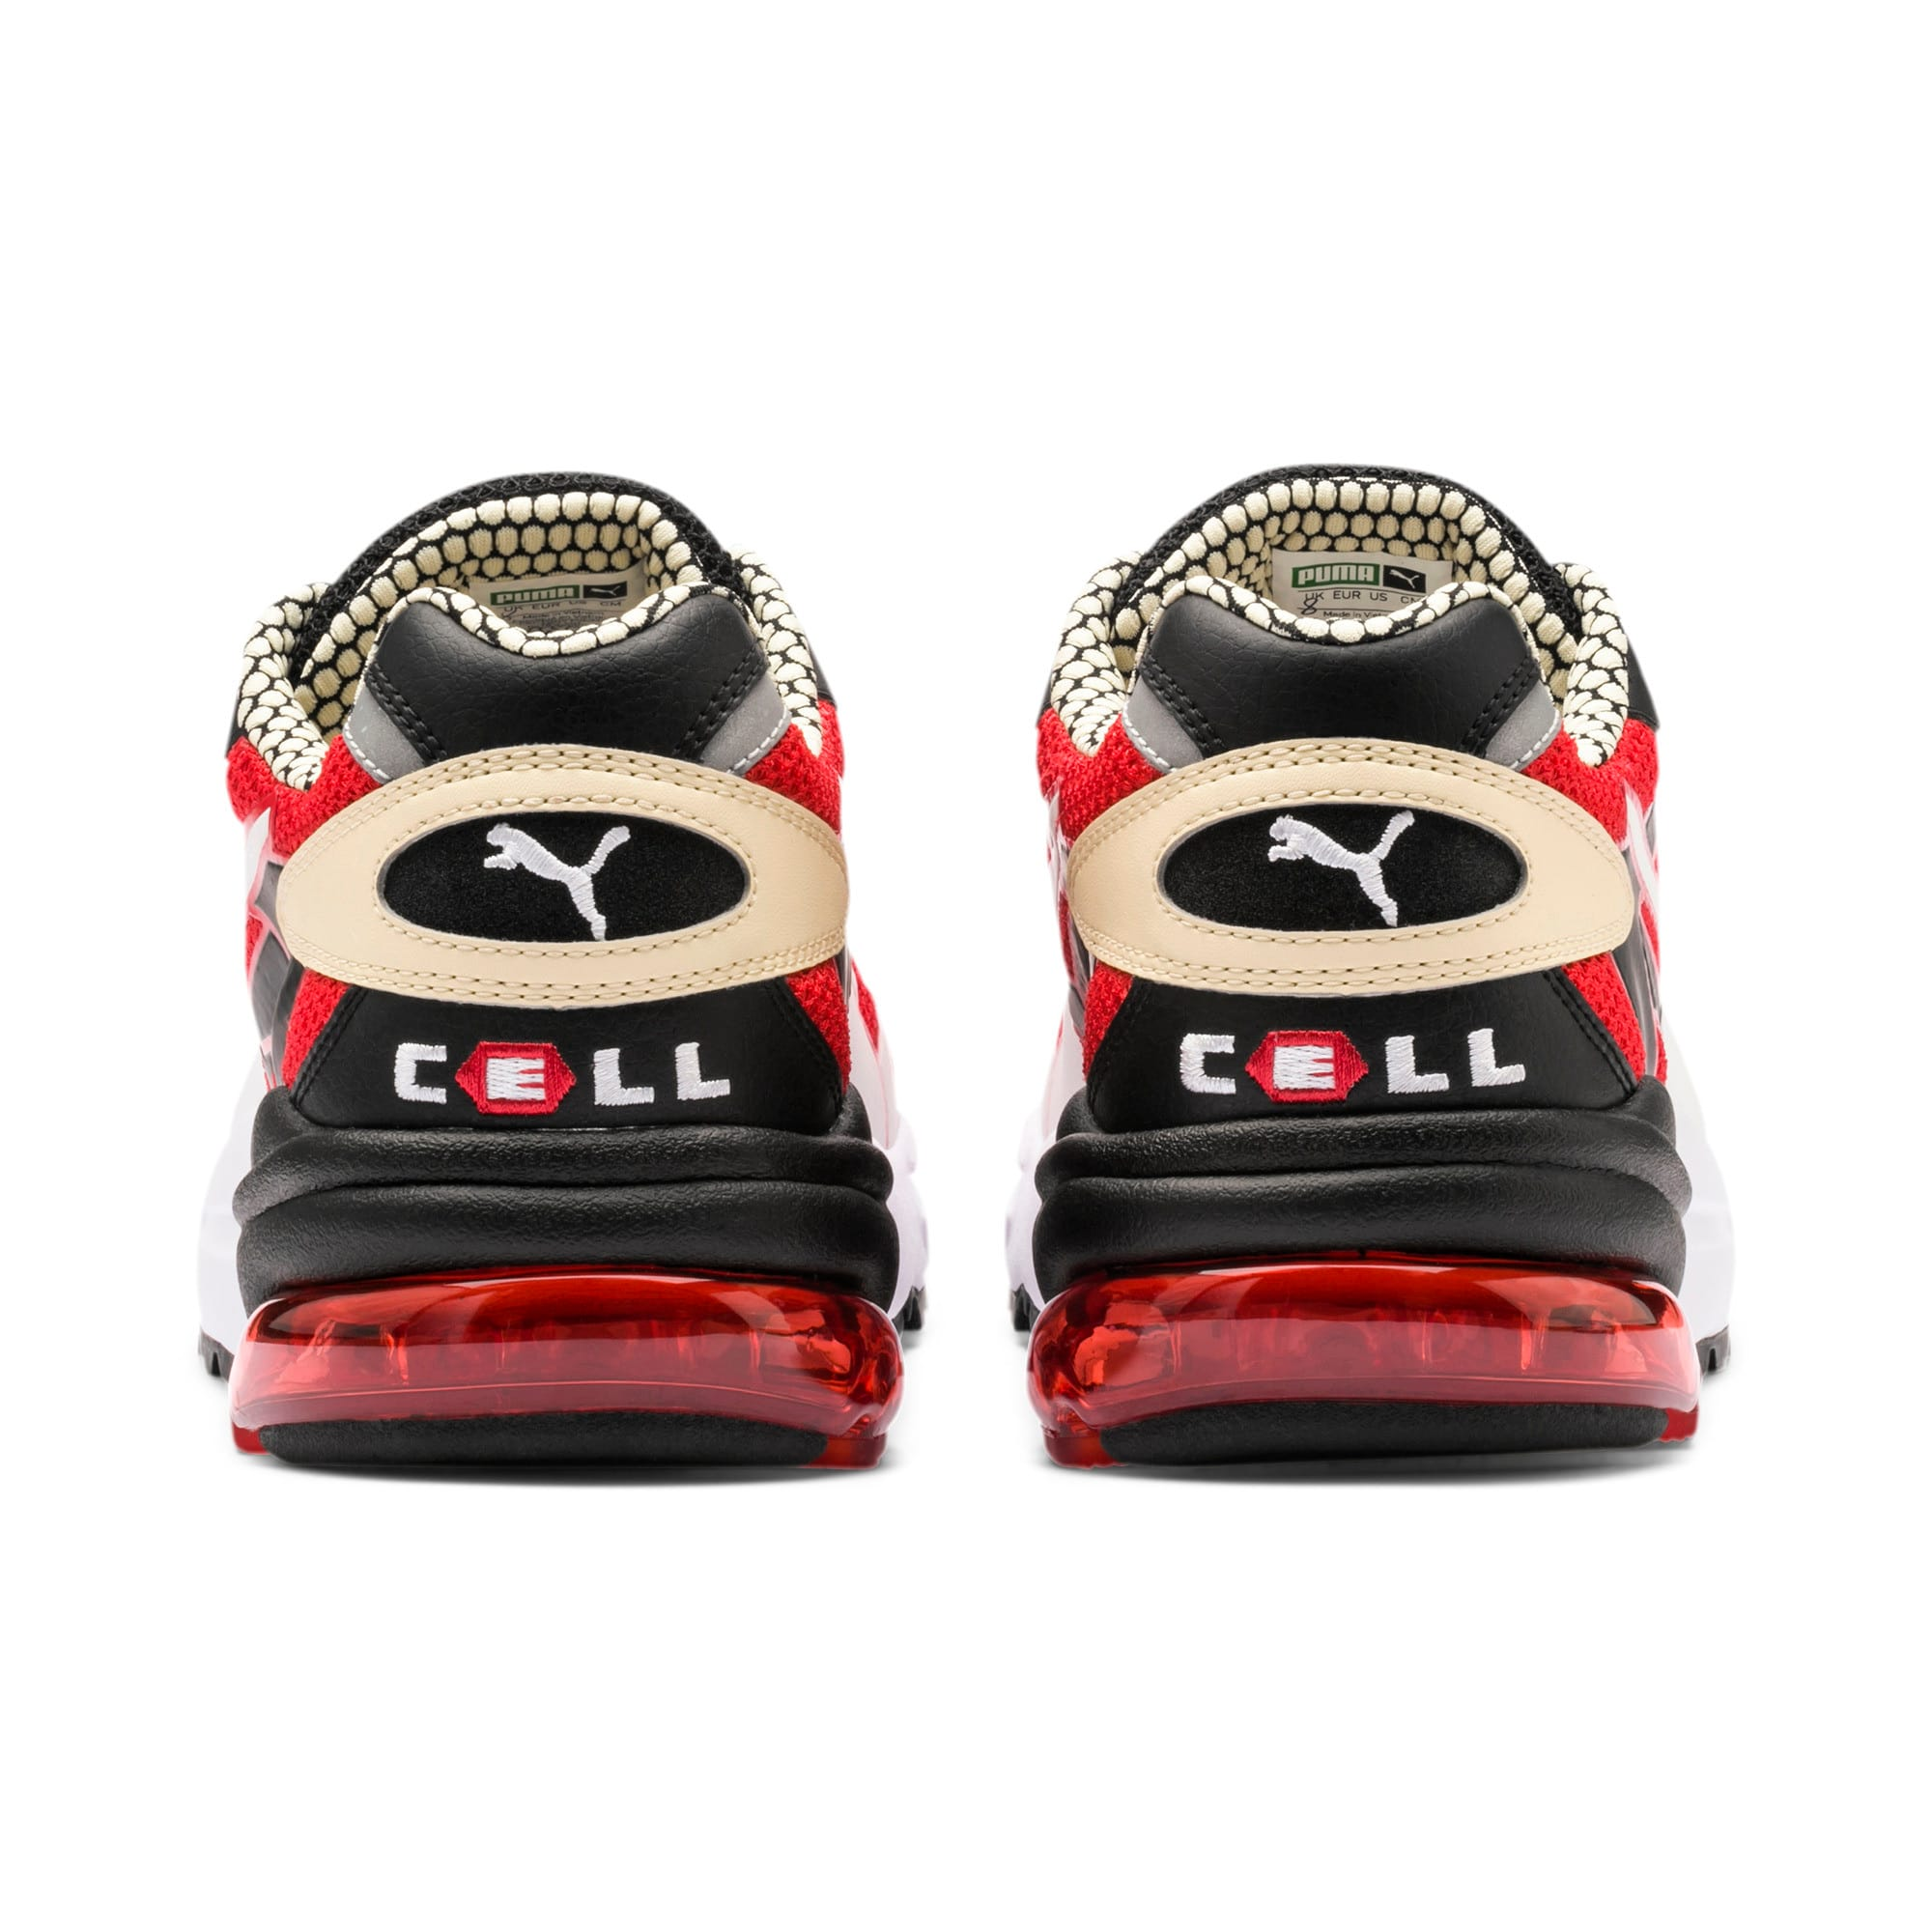 Thumbnail 4 of CELL Alien Kotto sportschoenen, High Risk Red-Puma Black, medium